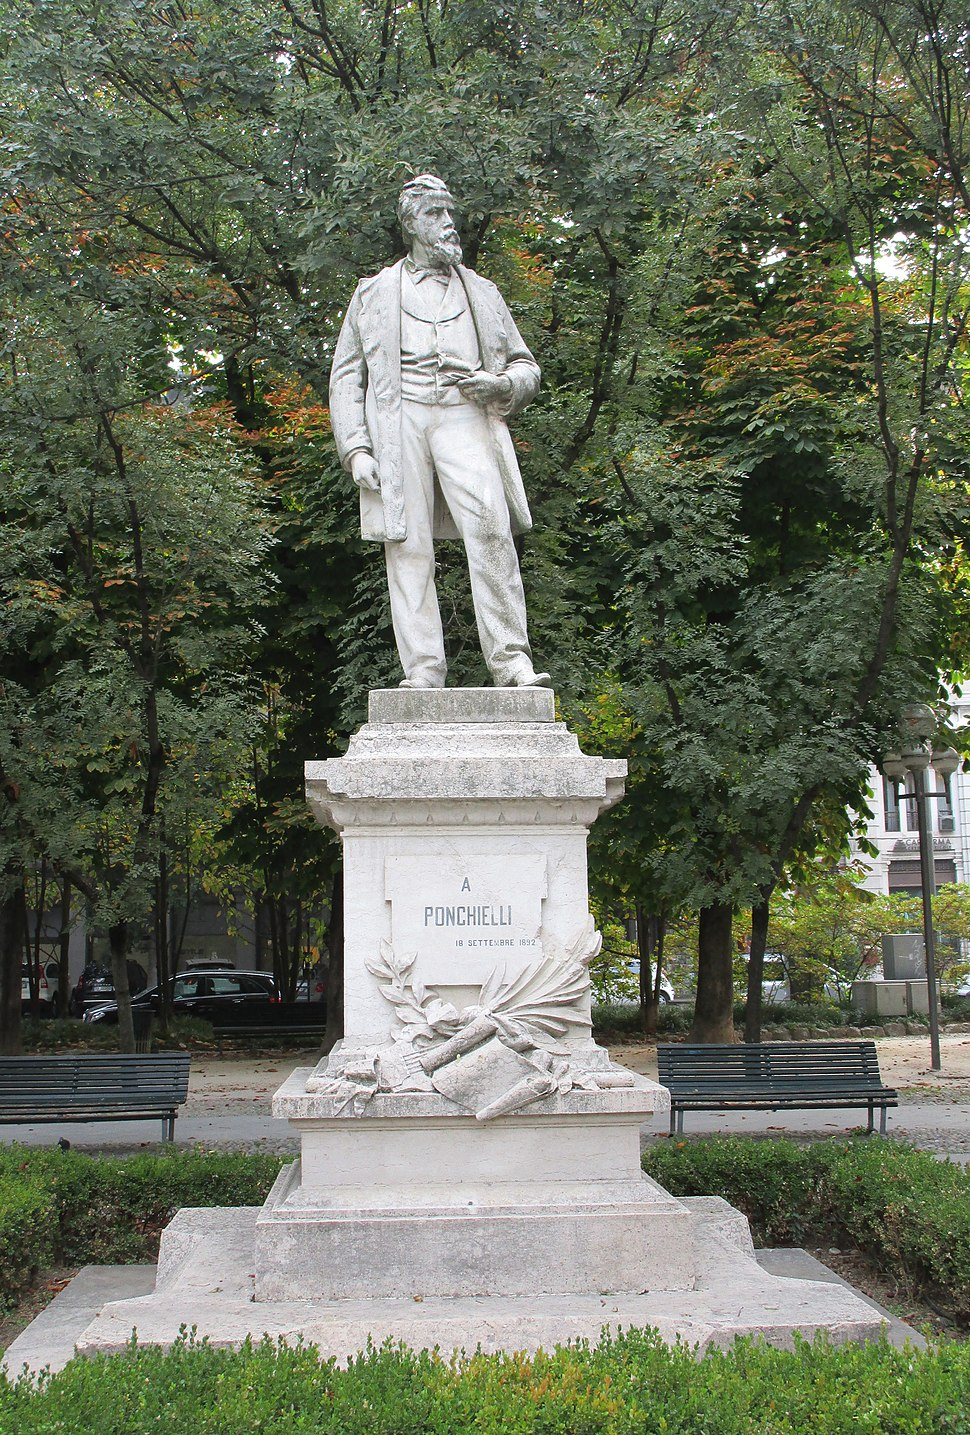 Ponchielli monument in Cremona Italy